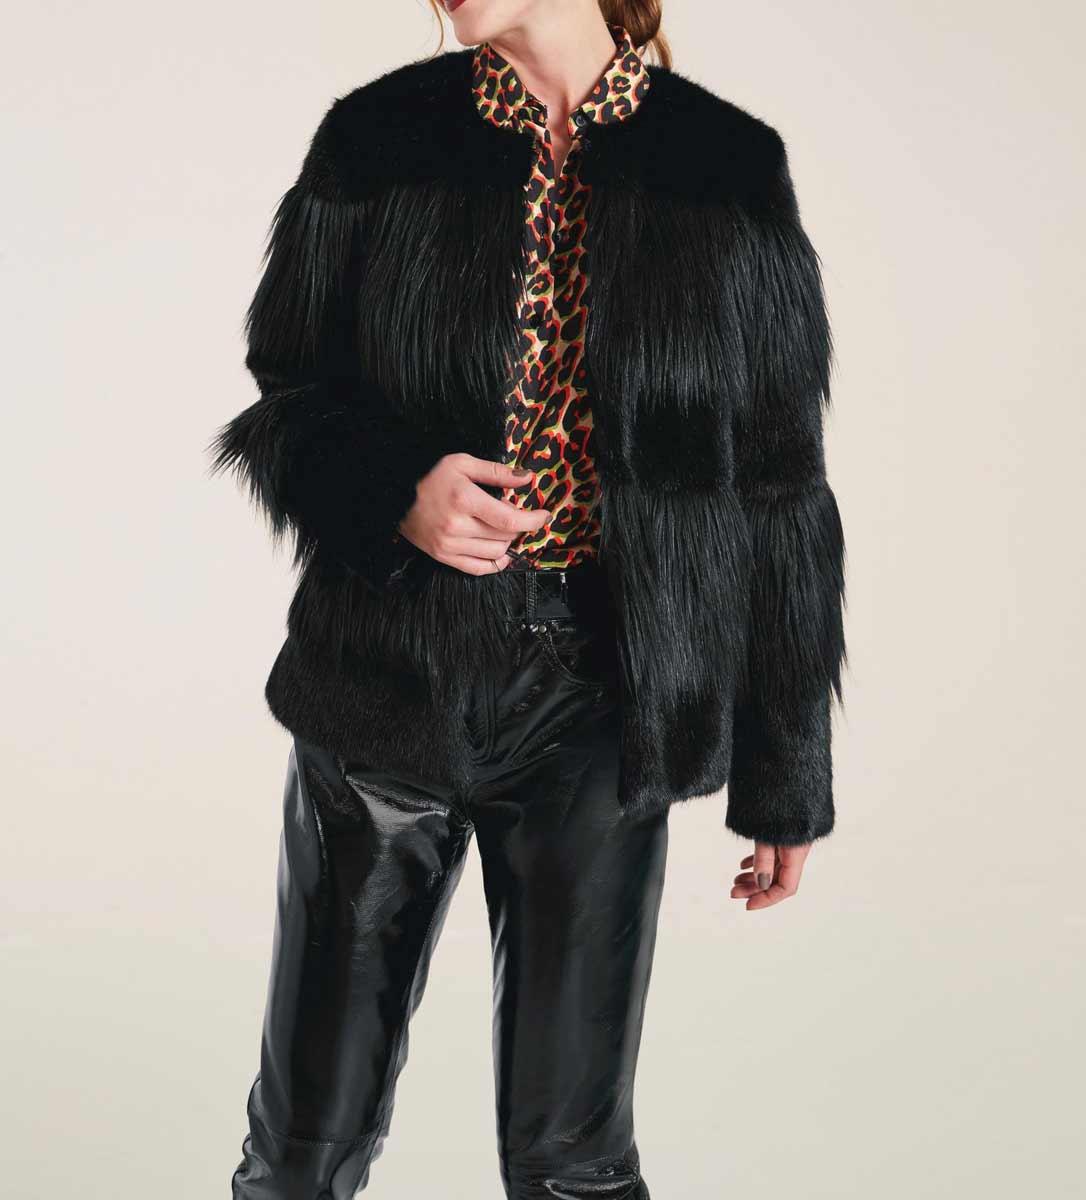 Rick Cardona Damen Jacke Webpelzjacke schwarz #missforty#